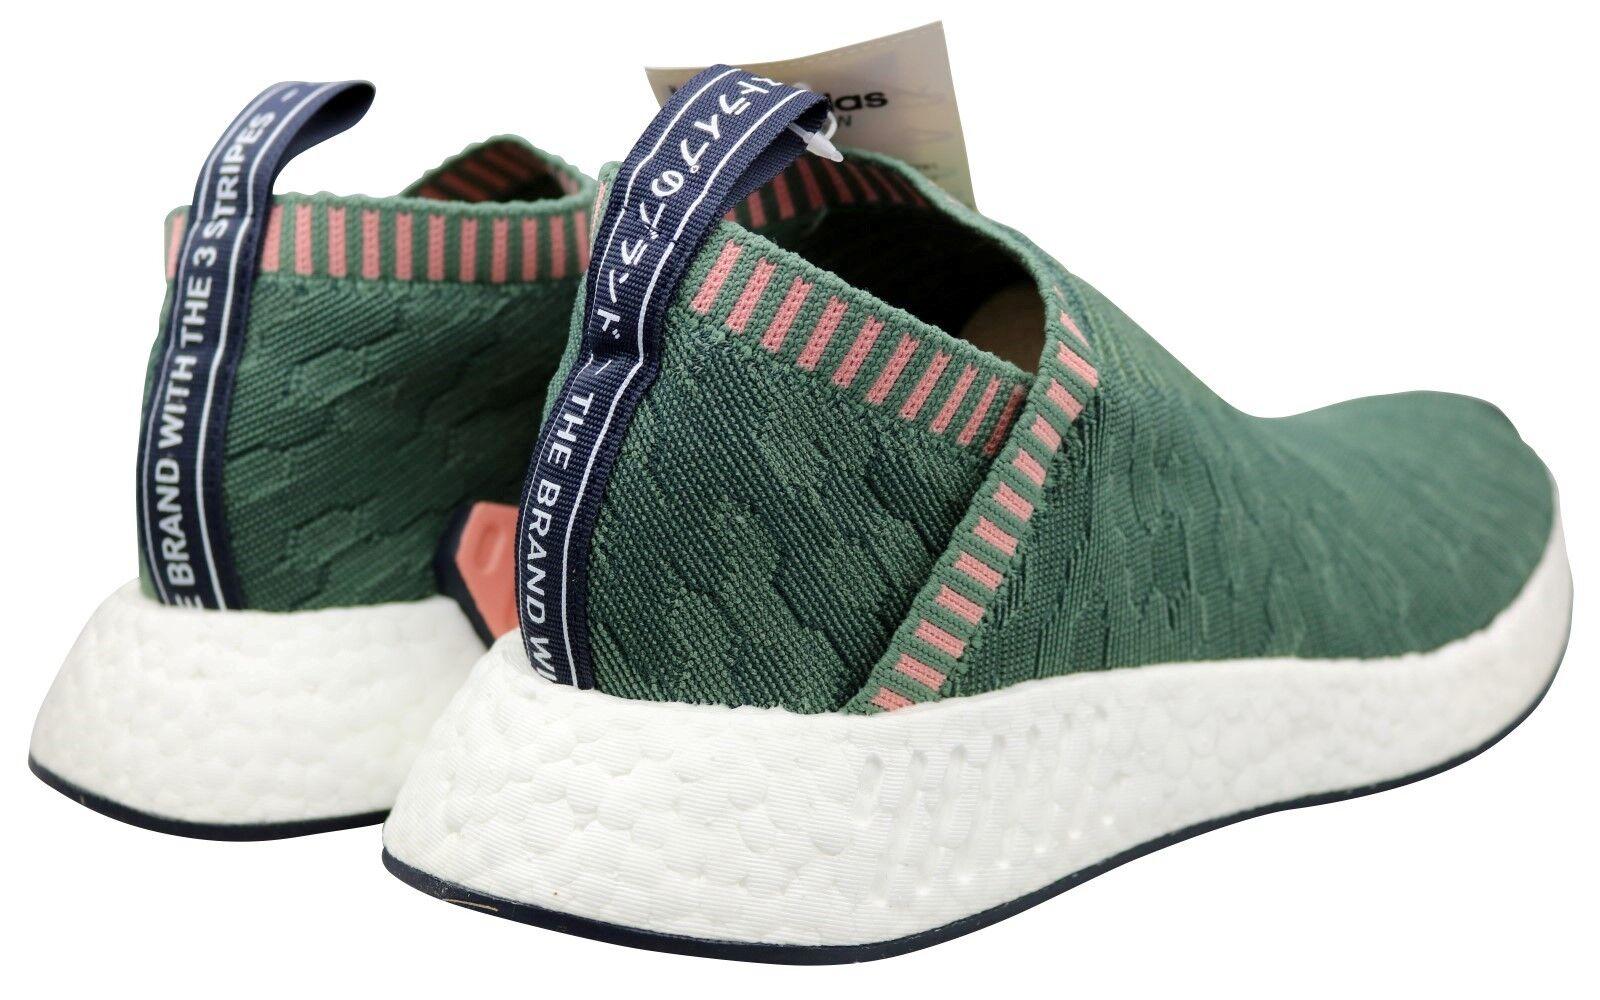 ADIDAS NMD CS2 PK W Primeknit Damen Damen Damen Sneaker BY8781 grün Gr. 36 - 42 NEU & OVP fb6644